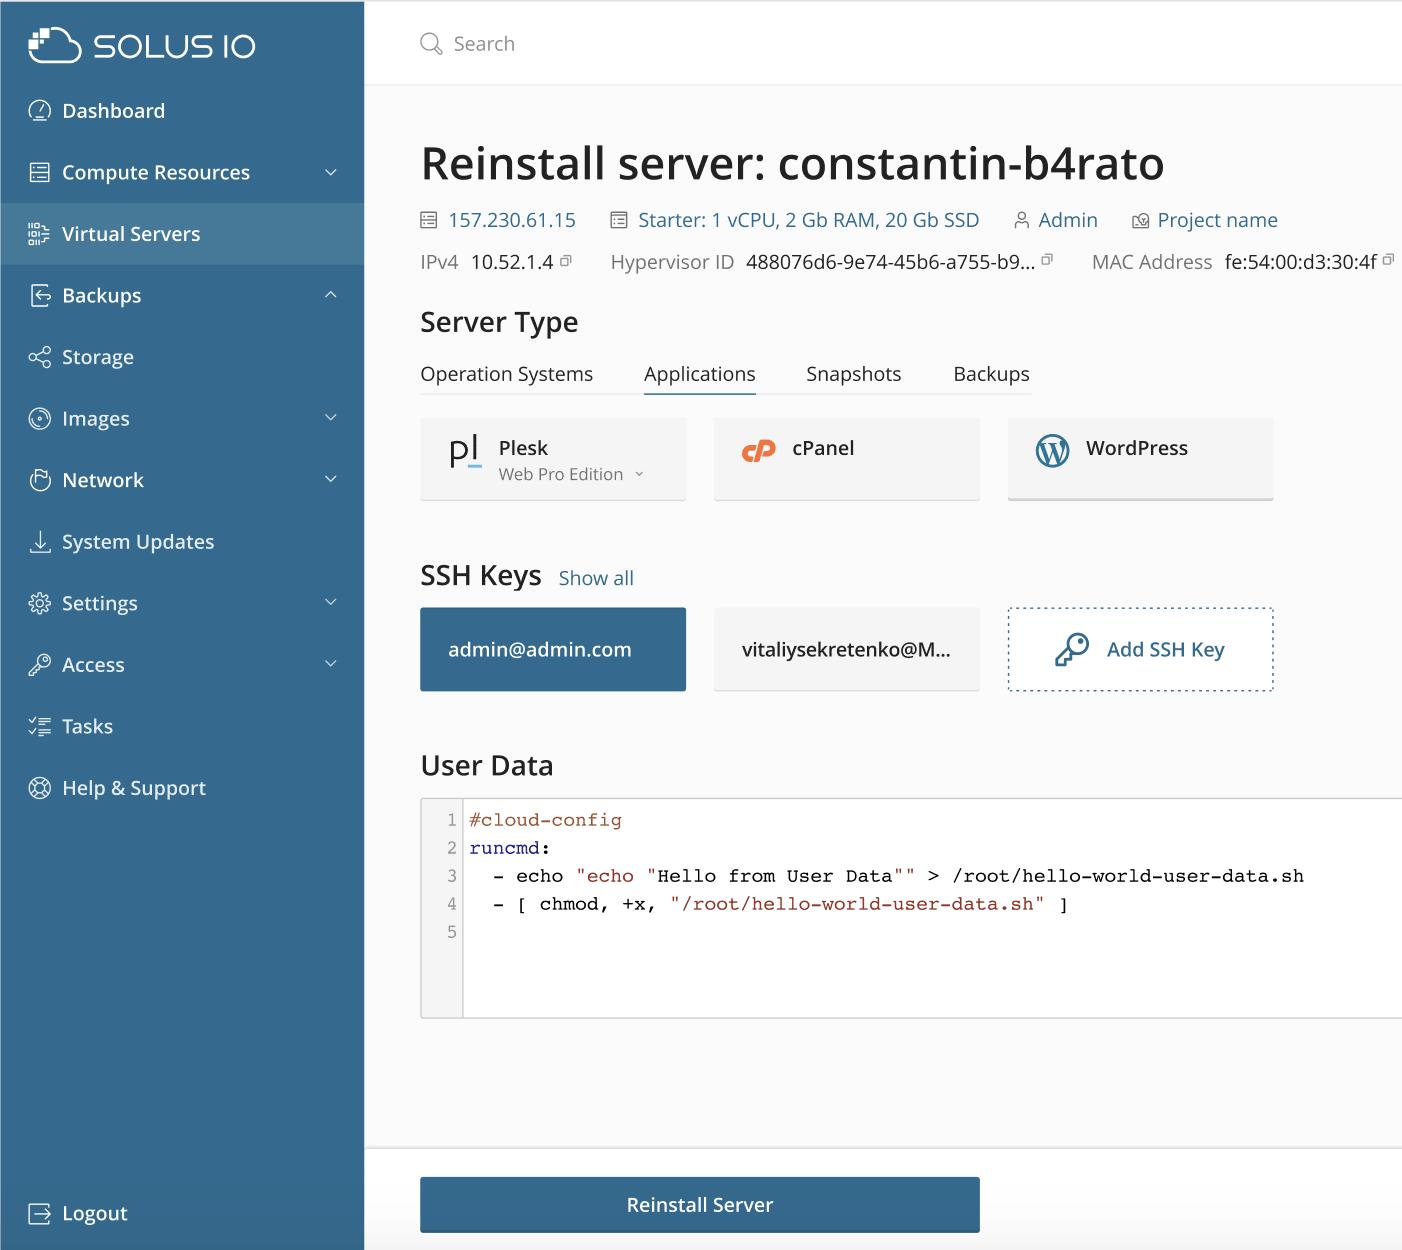 Reinstall server